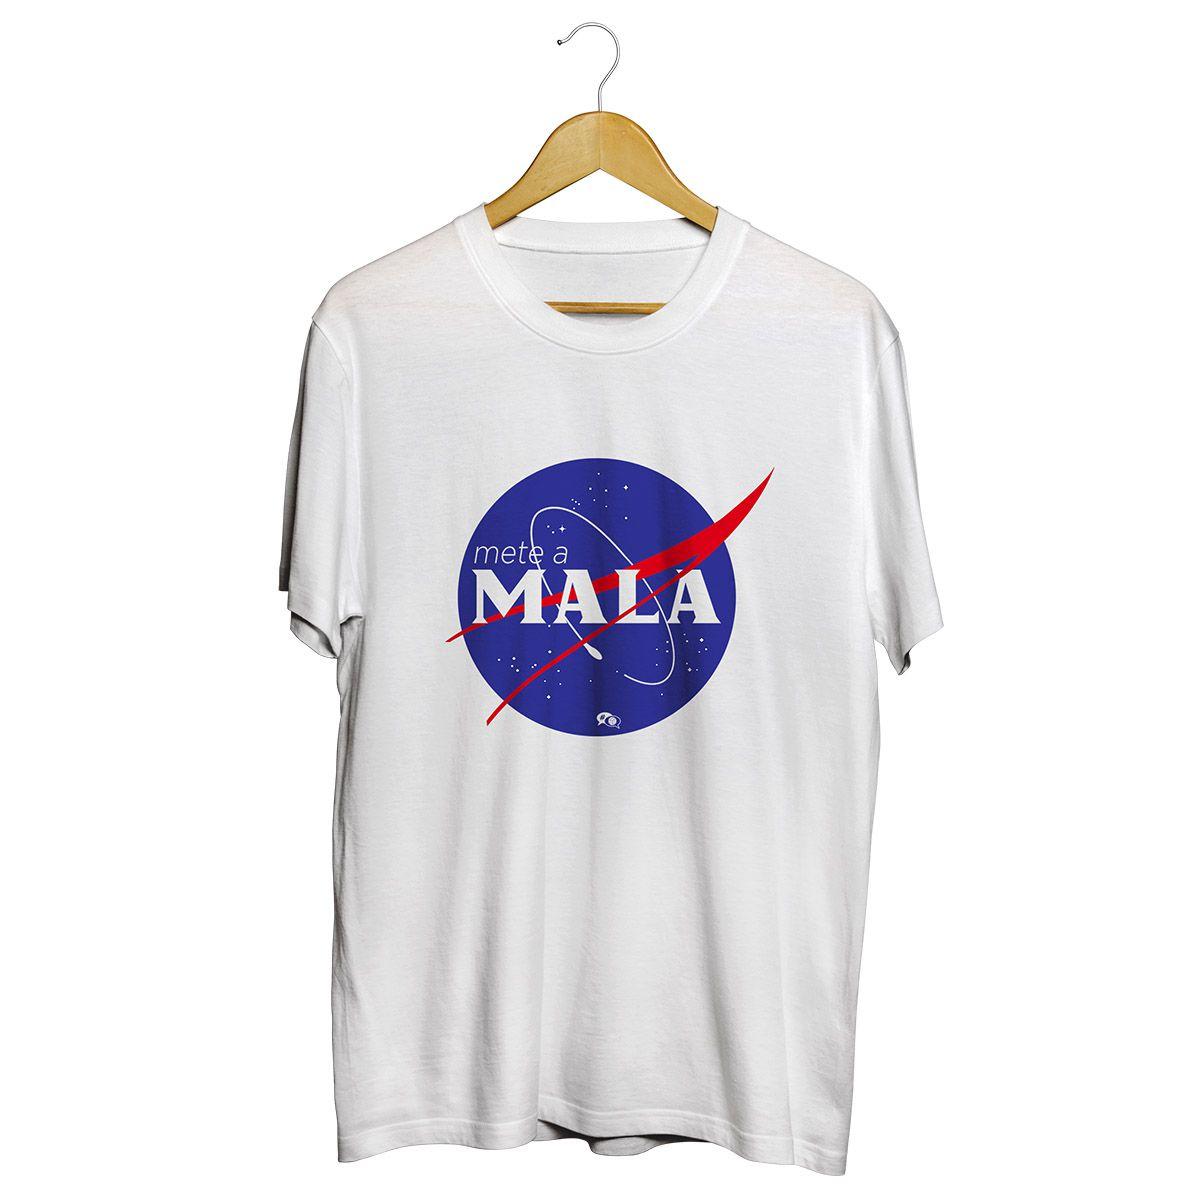 Camiseta - METE A MALA. Branca. Masculino